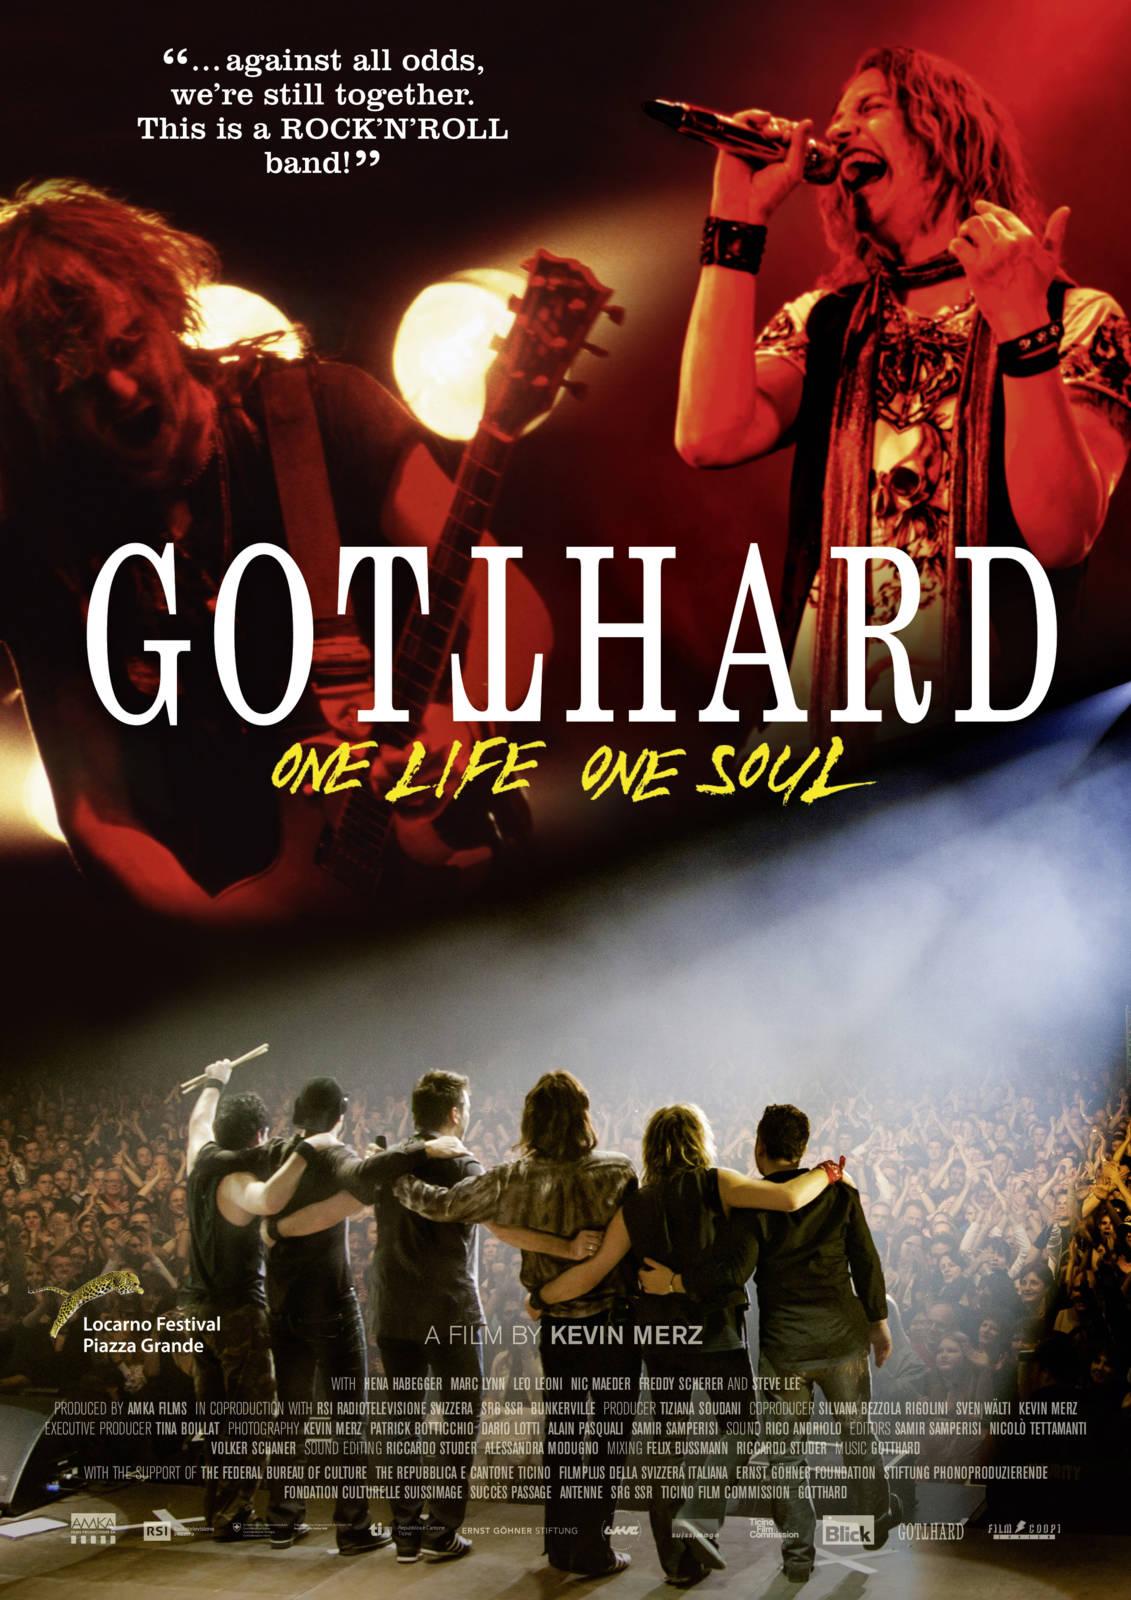 Film Gotthard One Life One Soul Cineman